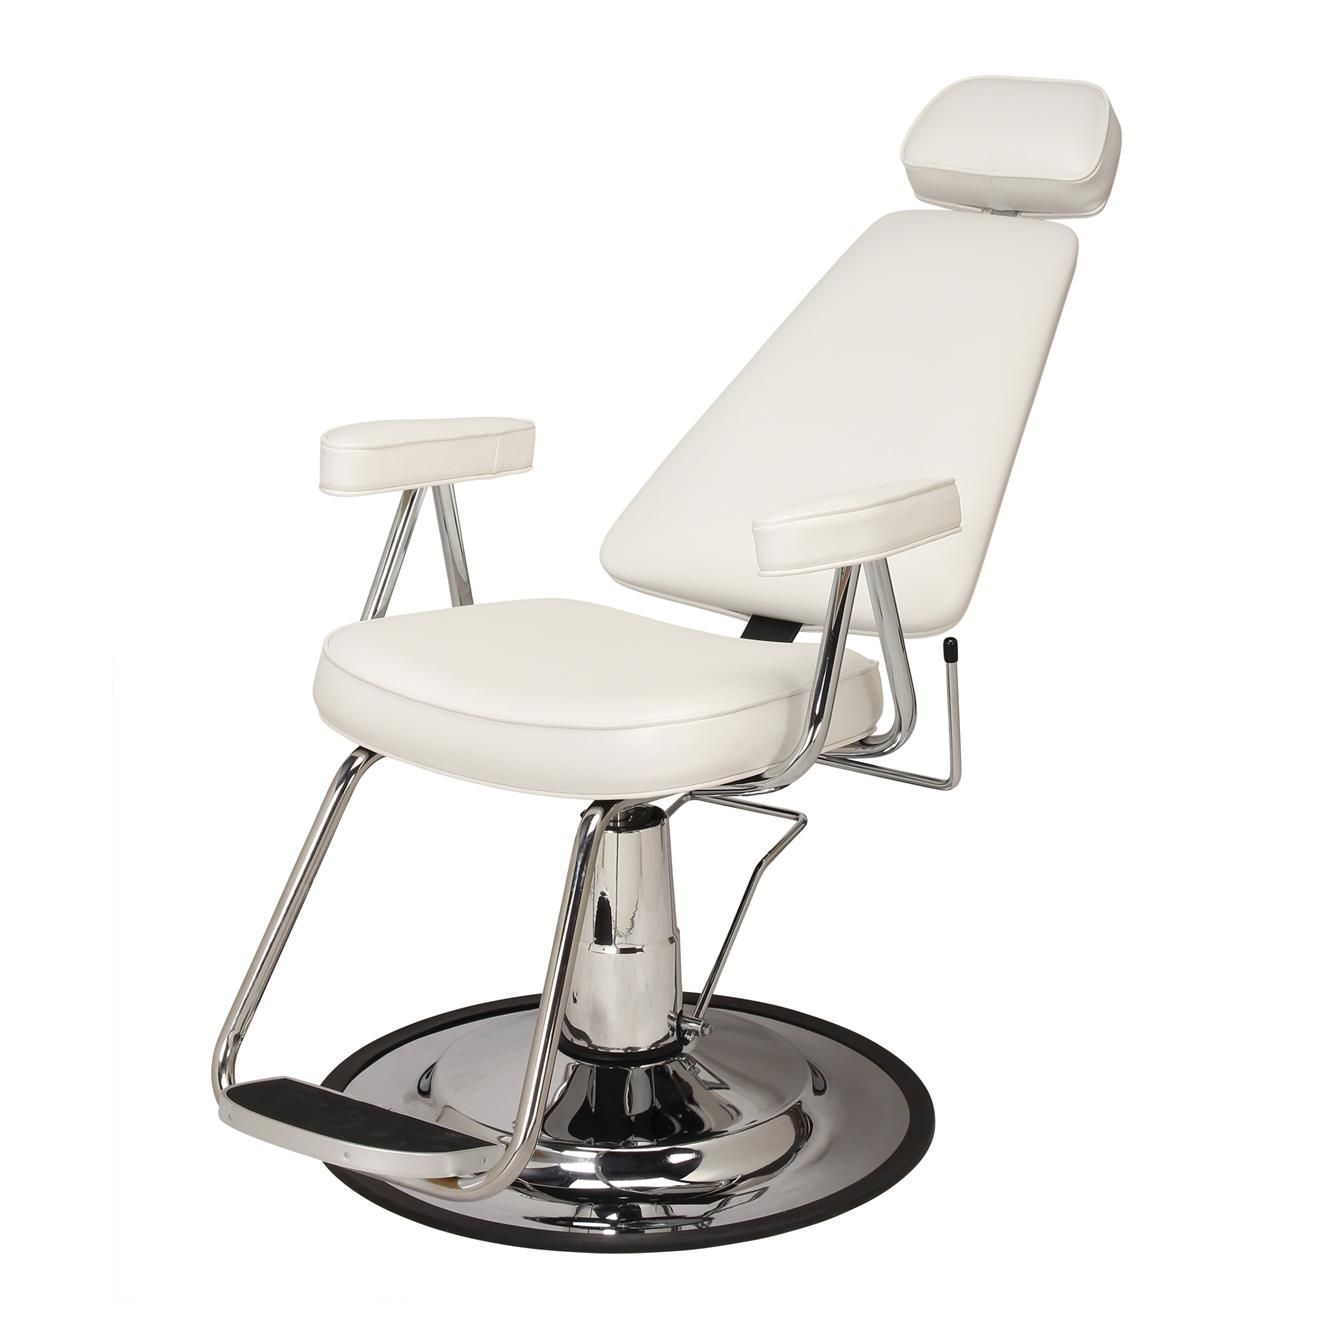 Paragon Carla Studio Make Up Chair Makeup Chair Makeup Studio Decor Beauty Equipment